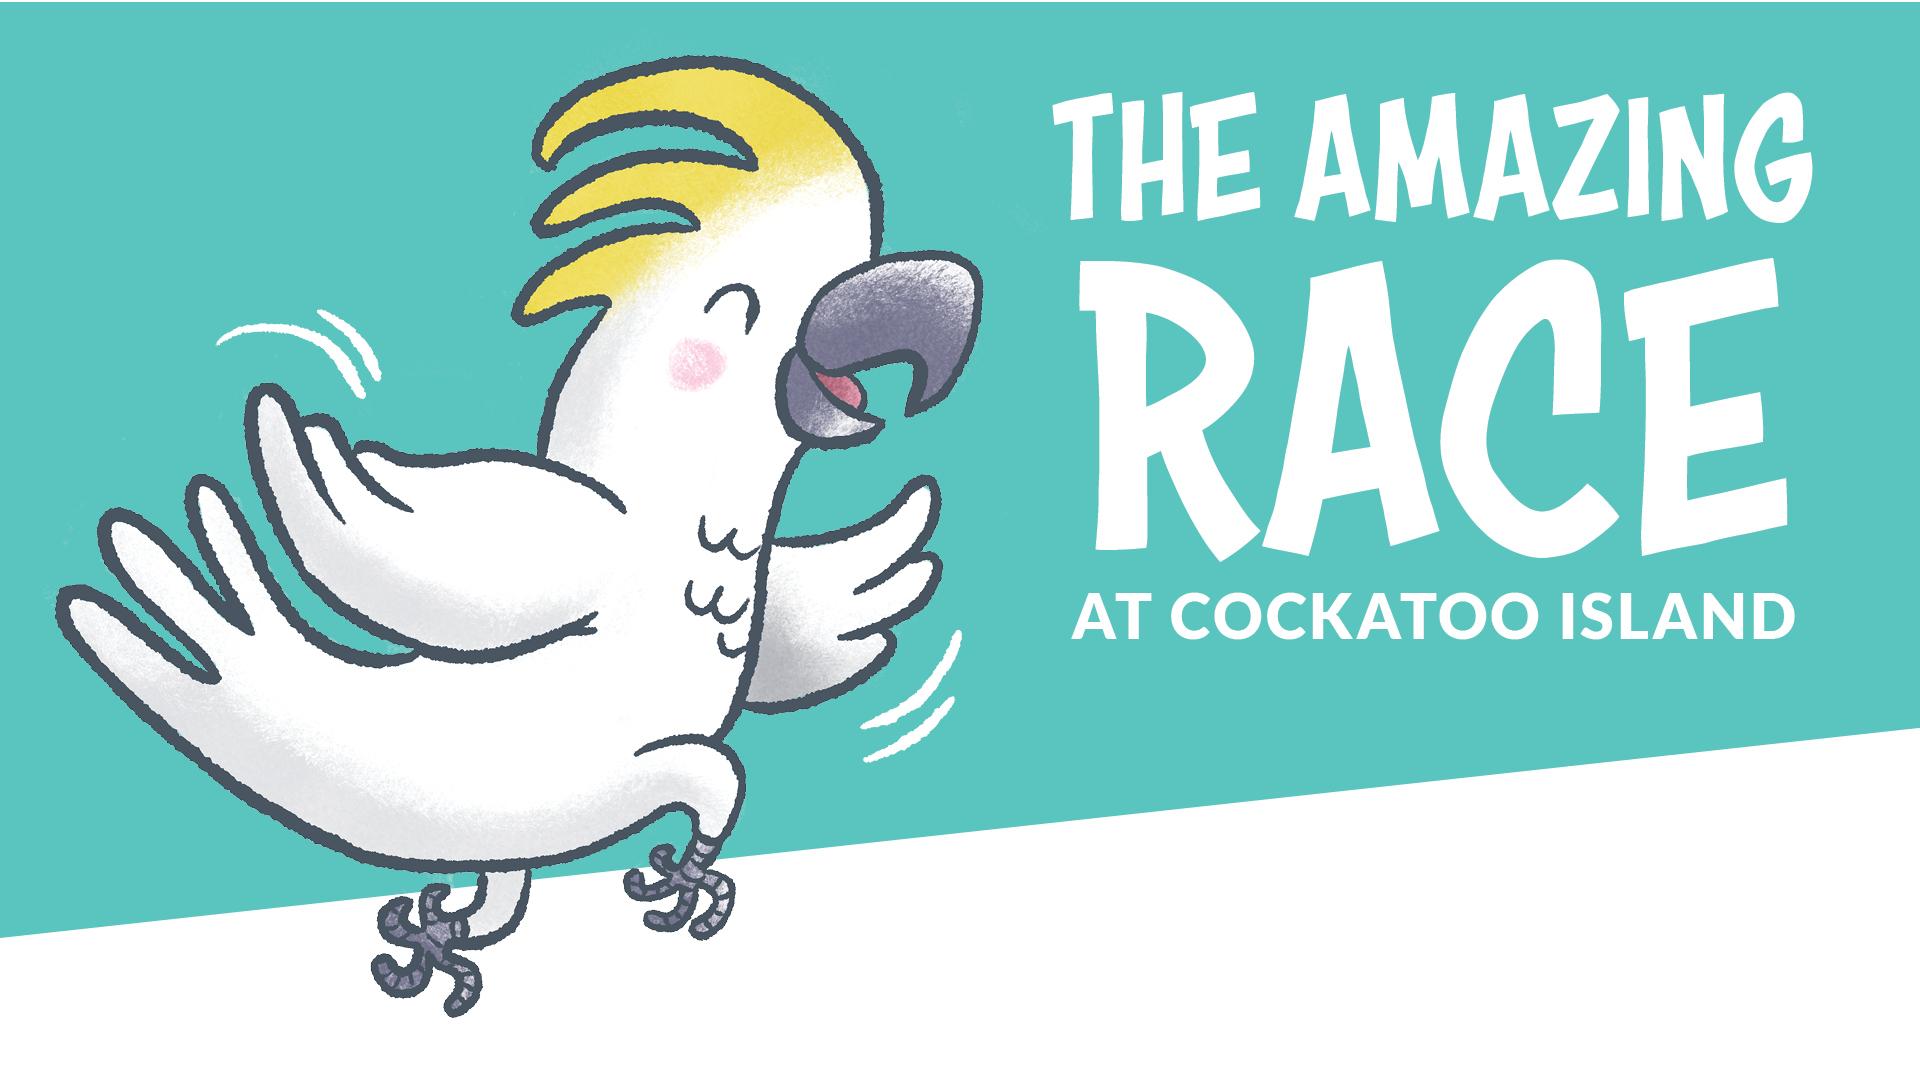 Amazing_Race_2019_Website_Image